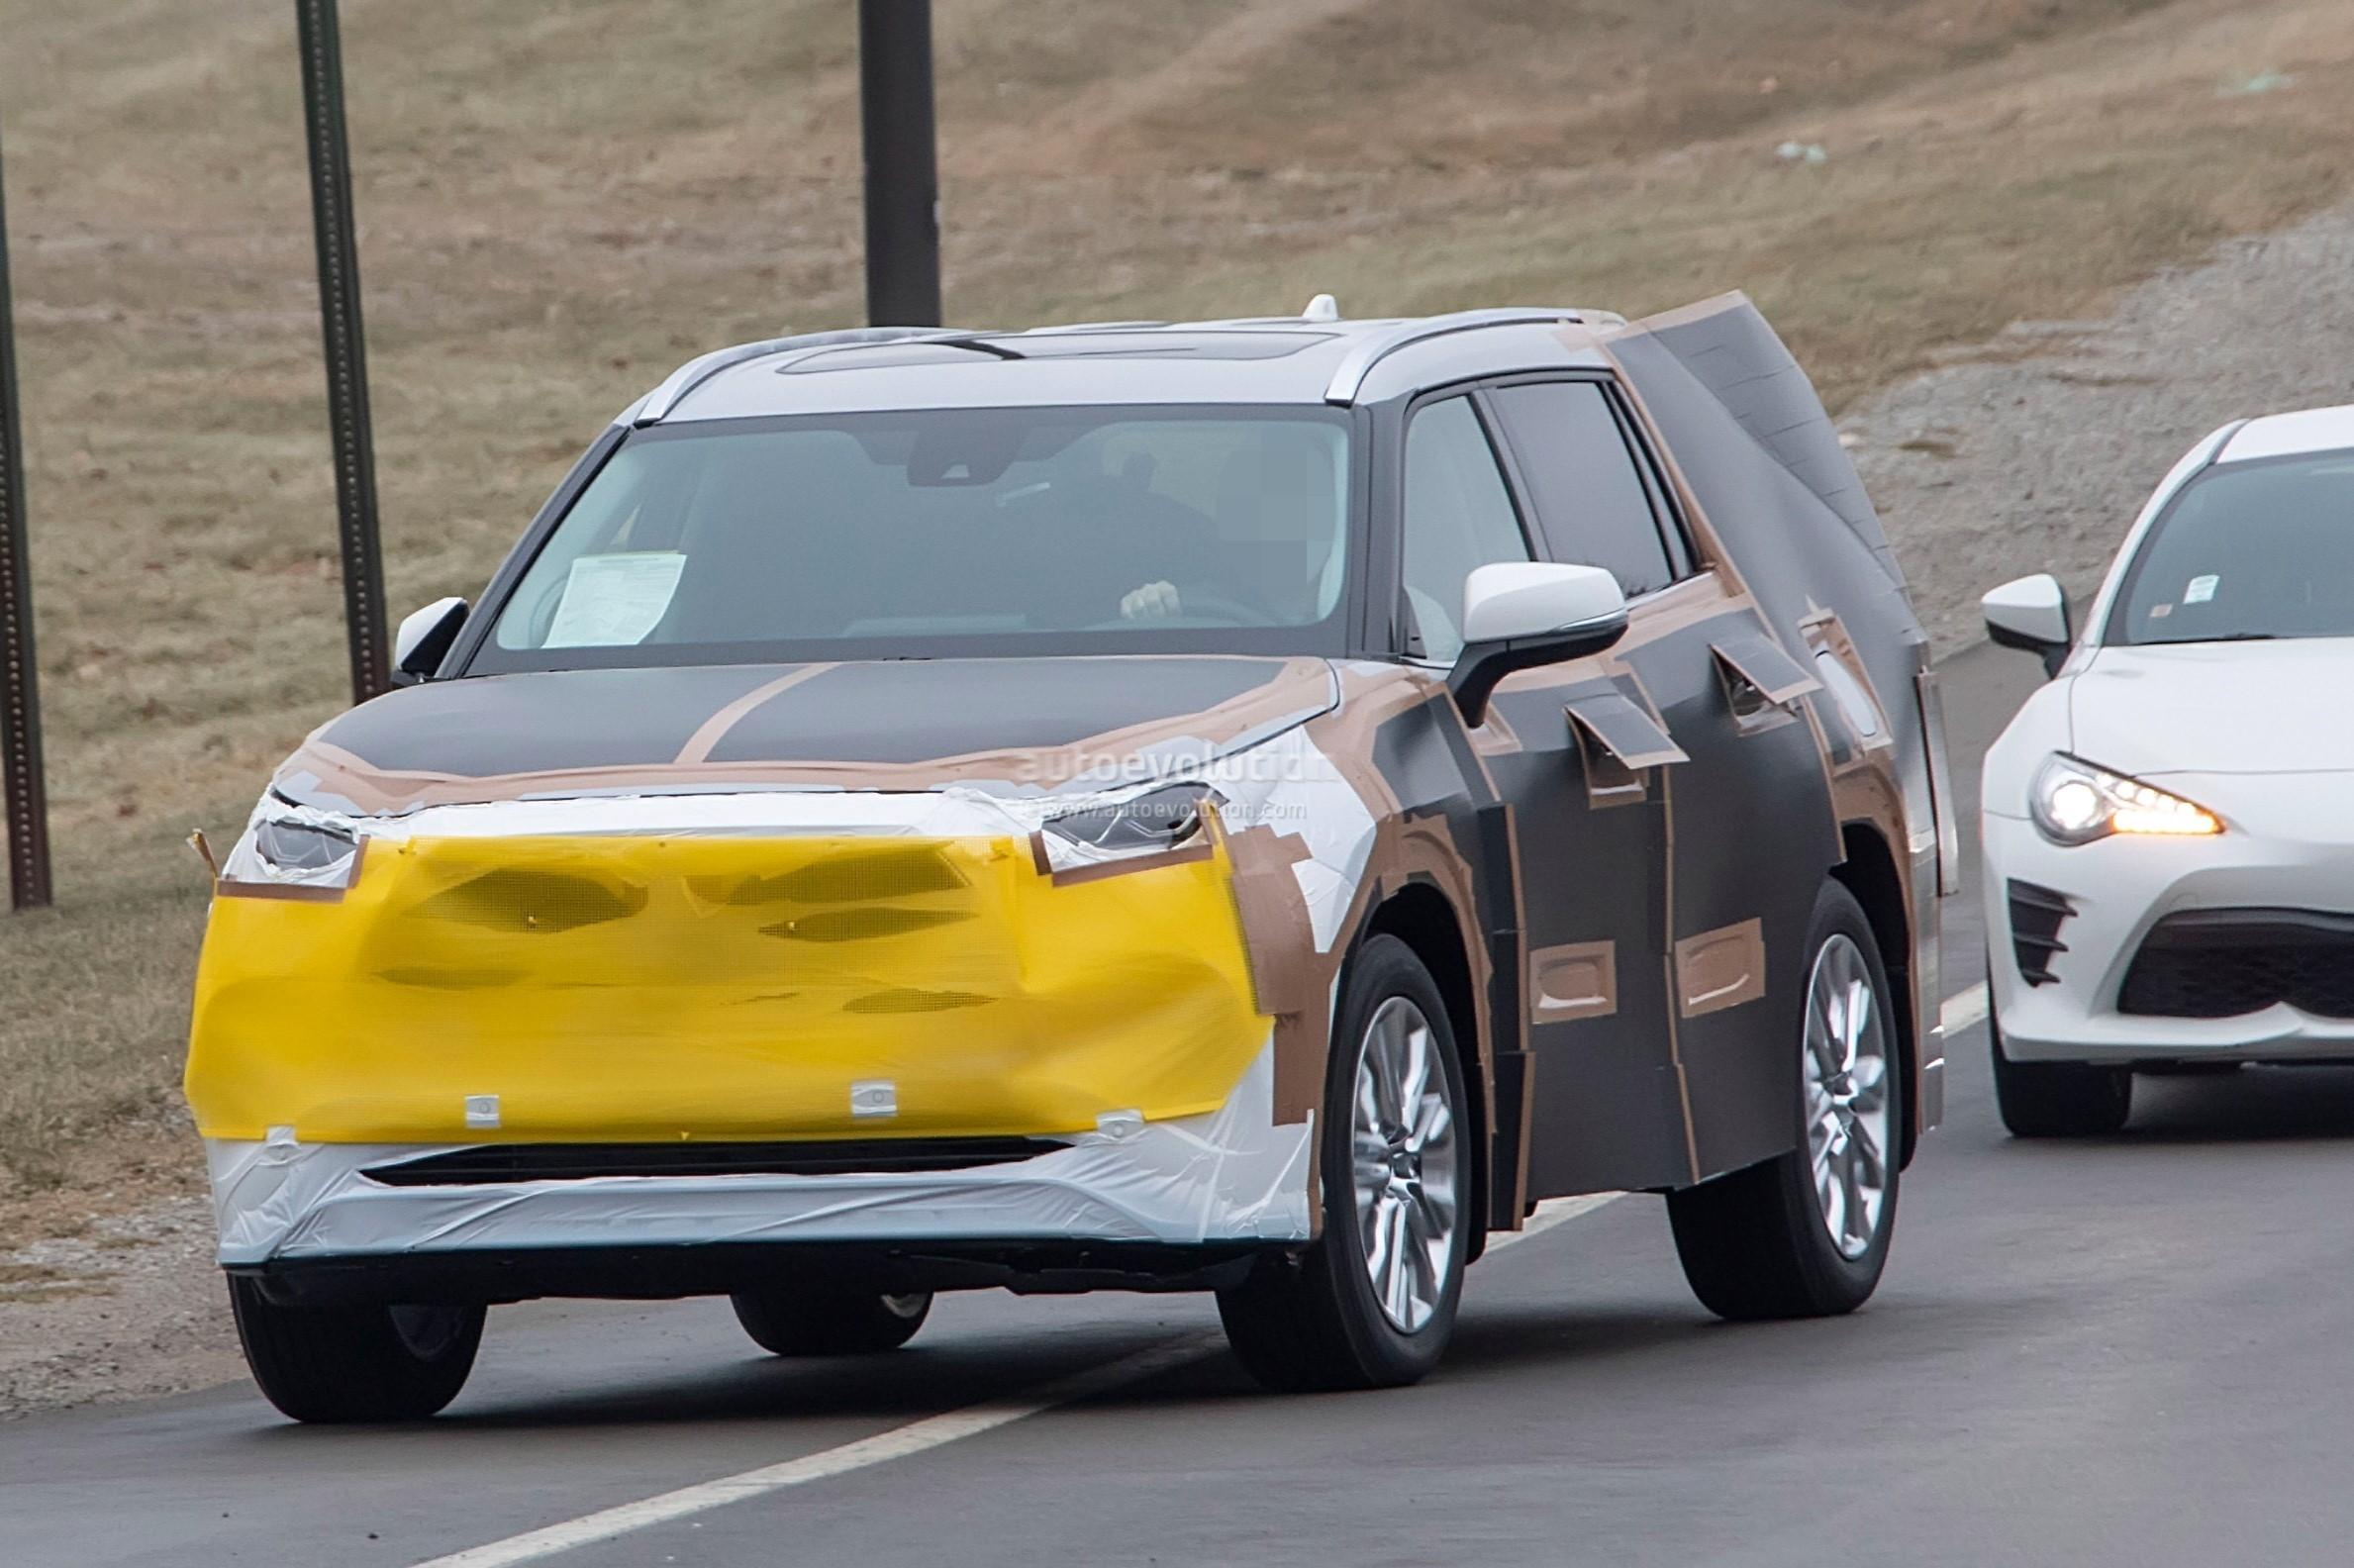 2020 Toyota Highlander Spied, Features RAV4-inspired Front ...